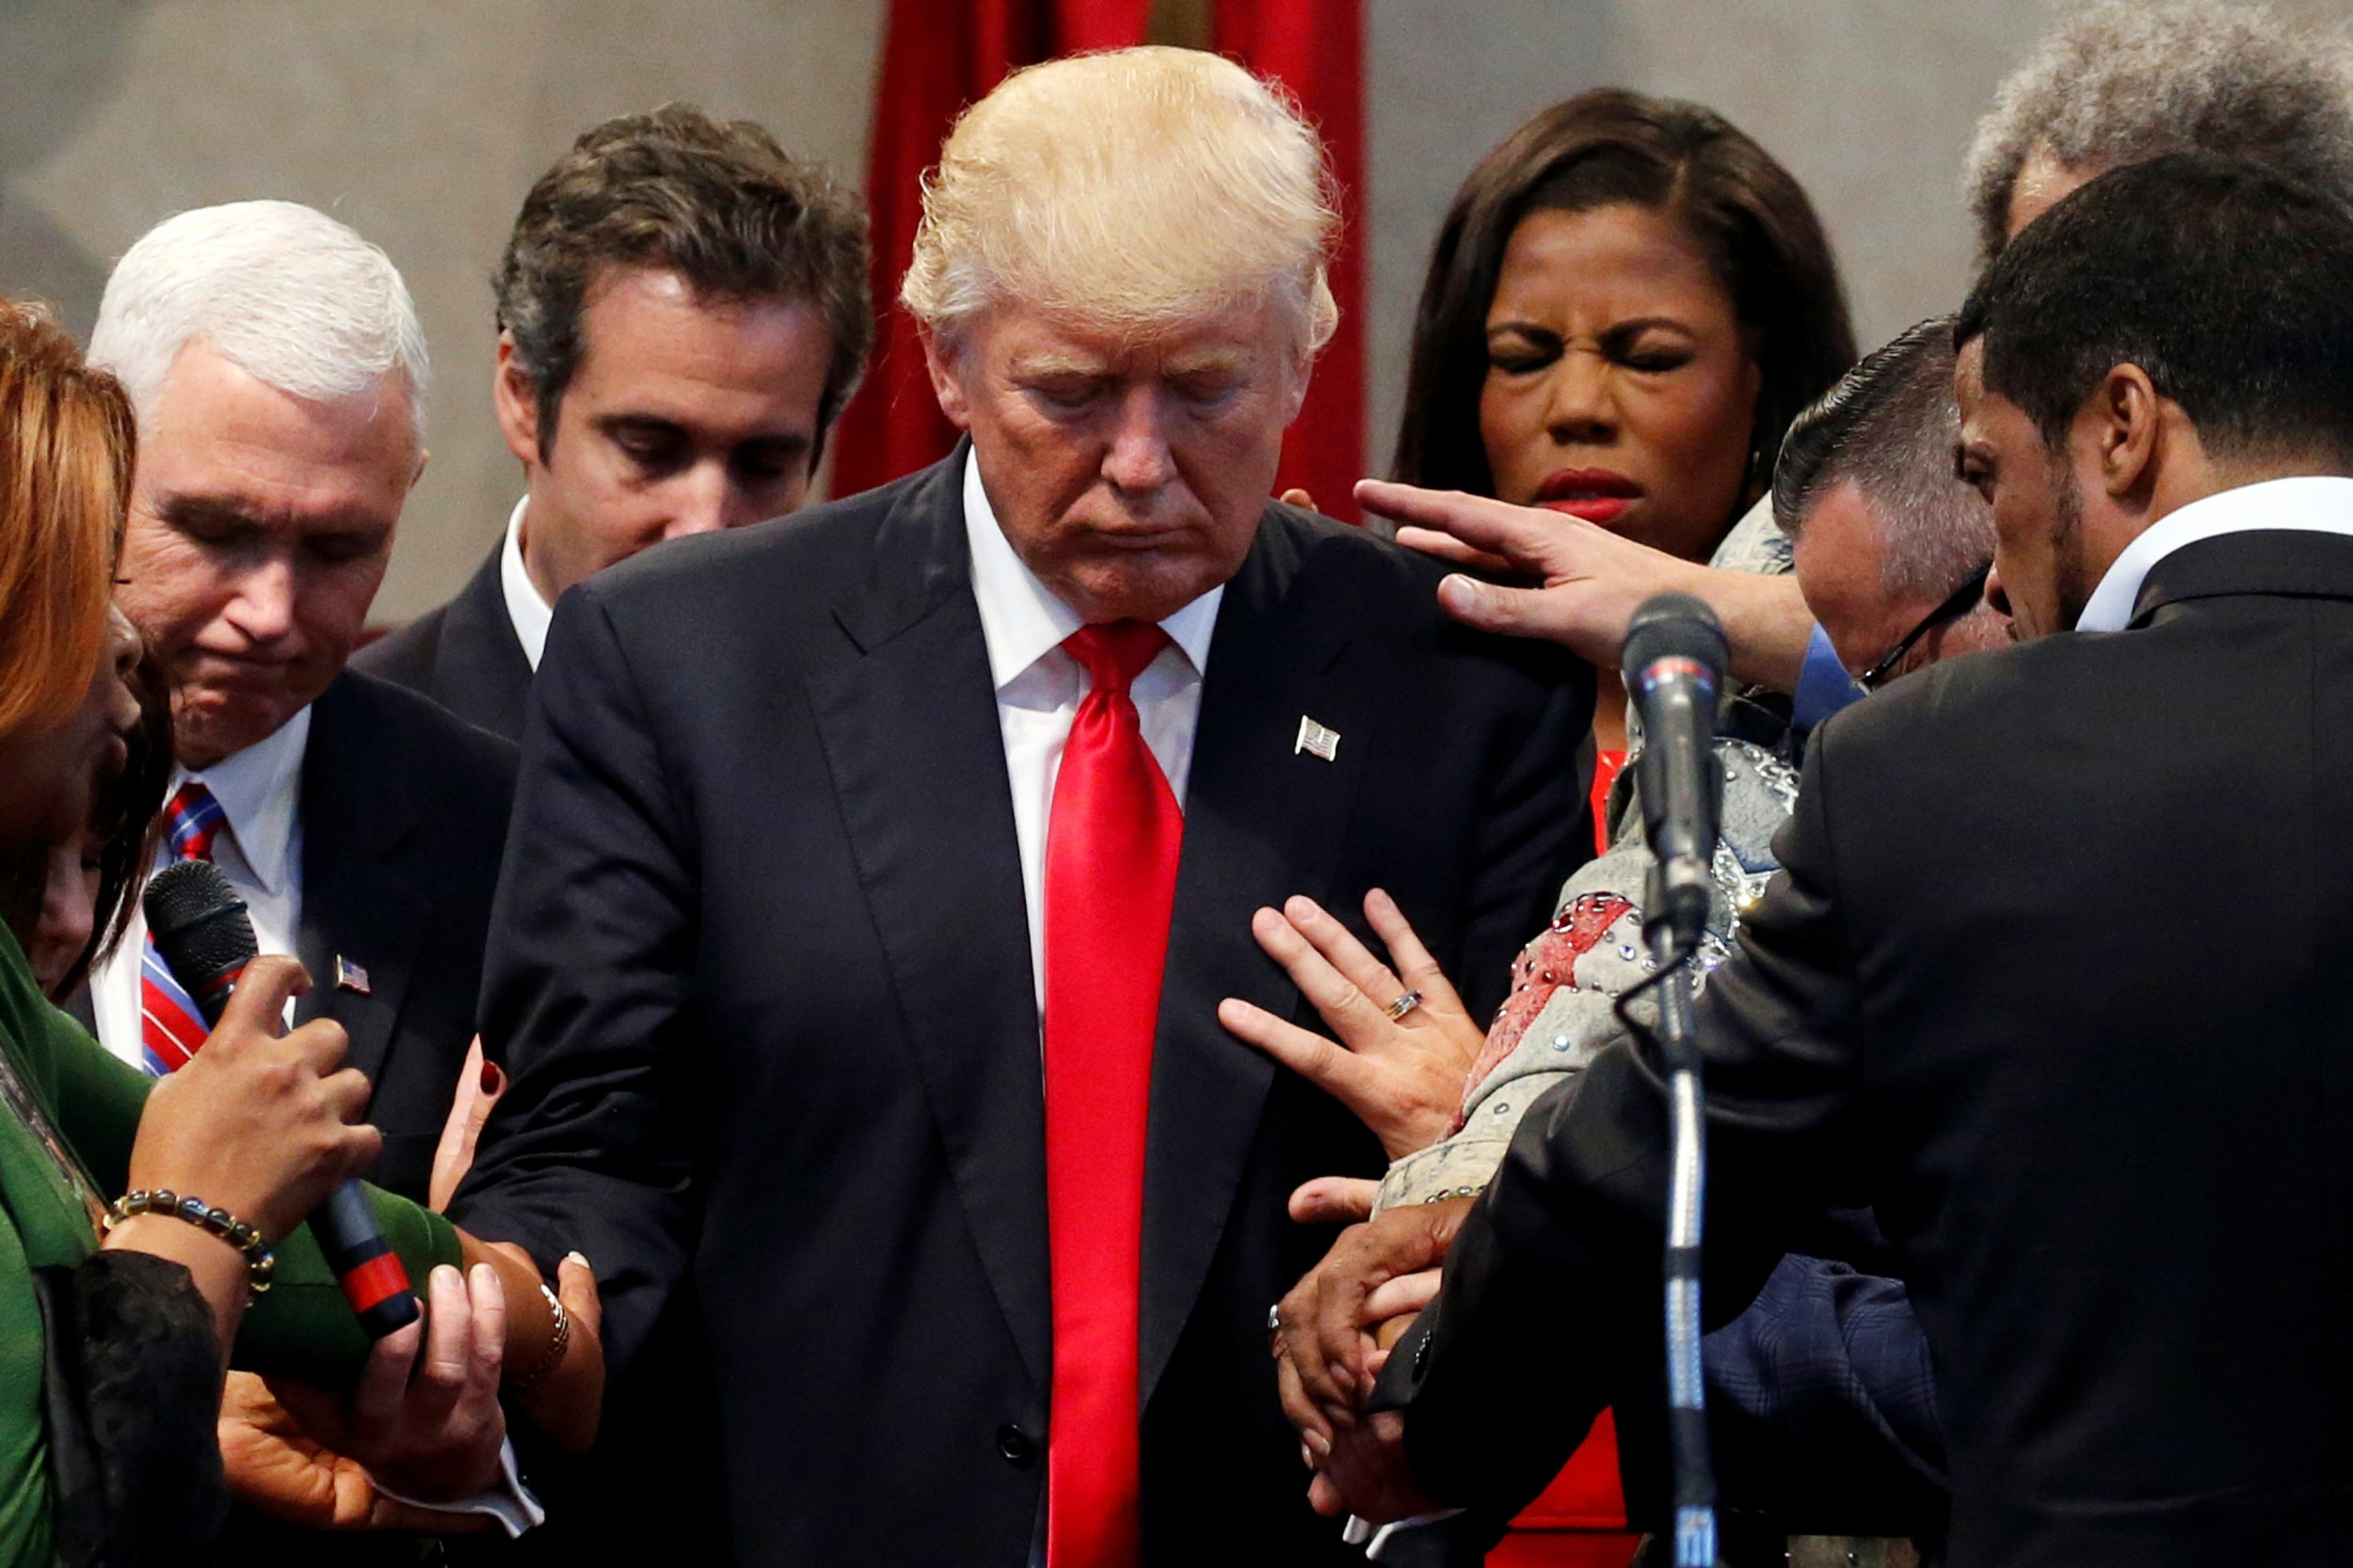 09_12_Trump_stop_frisk